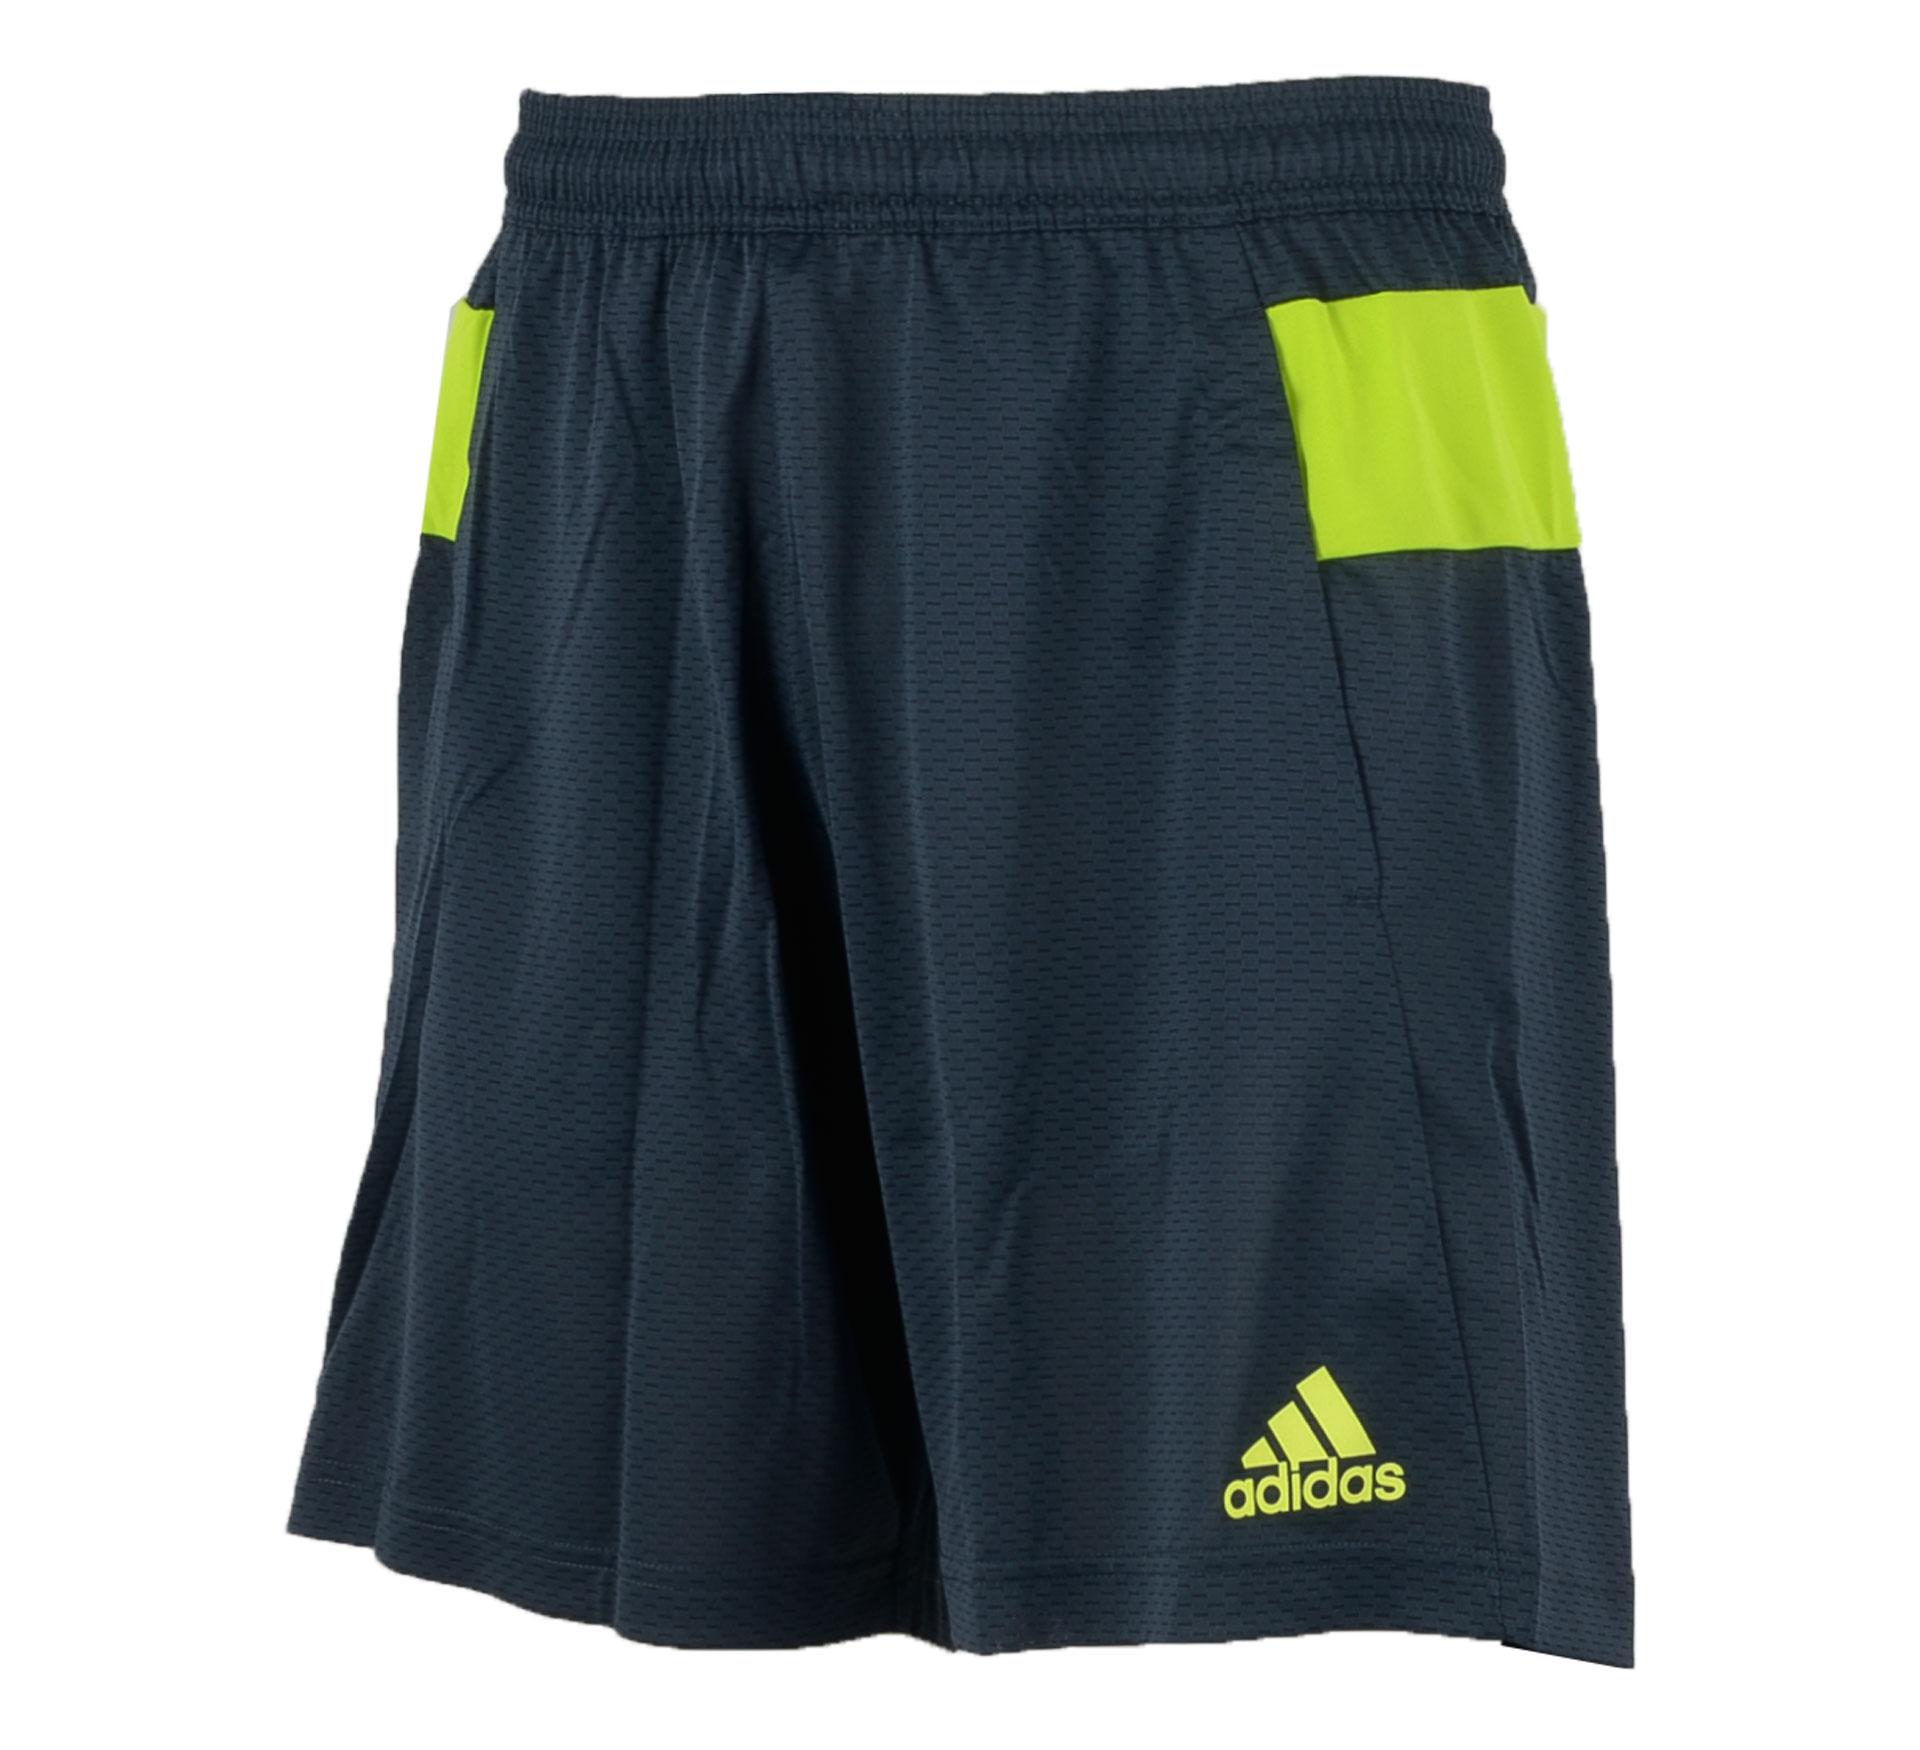 Adidas Nitrocharge Trainings Short Heren grijs - lime